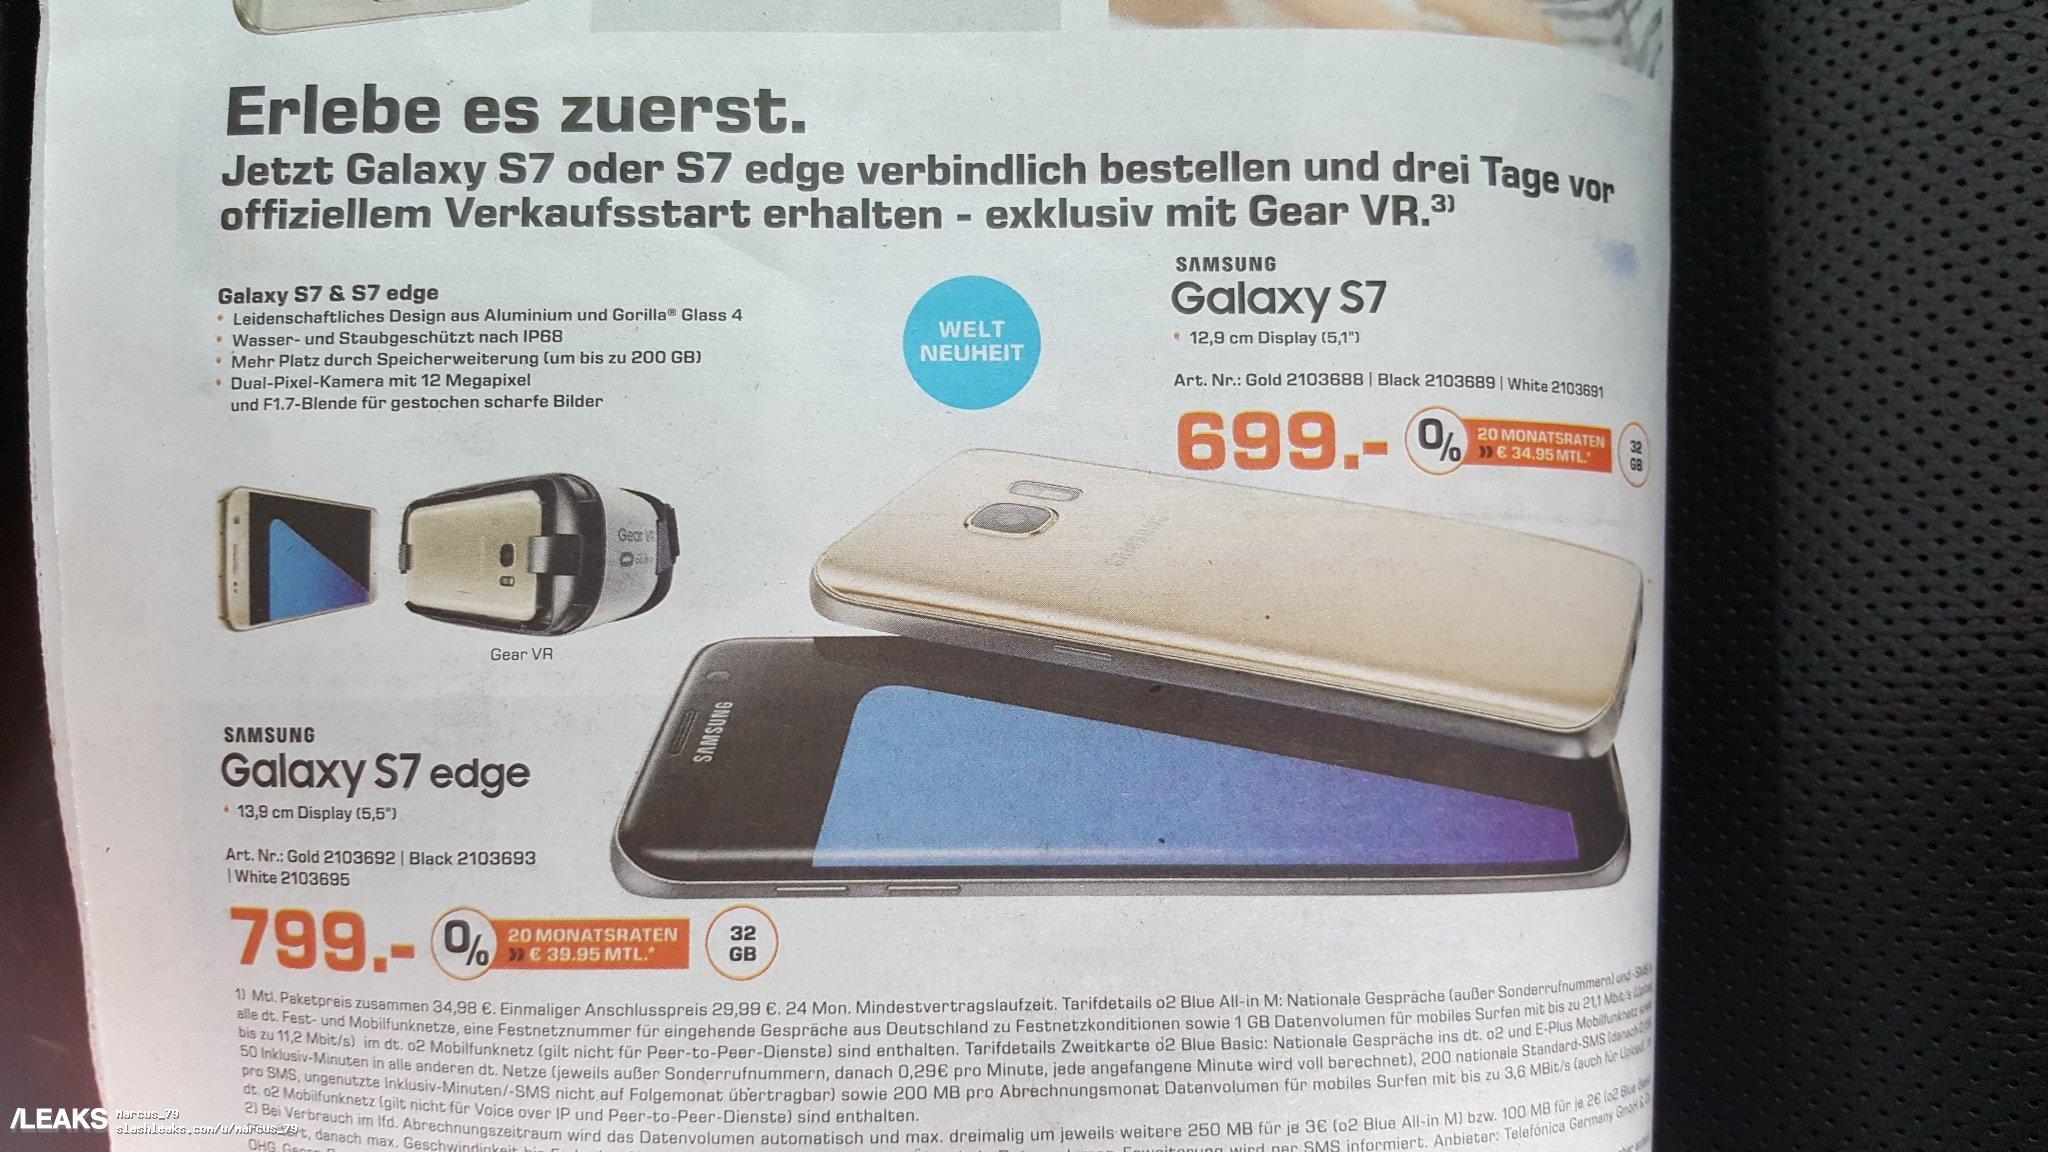 img German retailer confirms Galaxy S7 & Galaxy S7 Edge prices